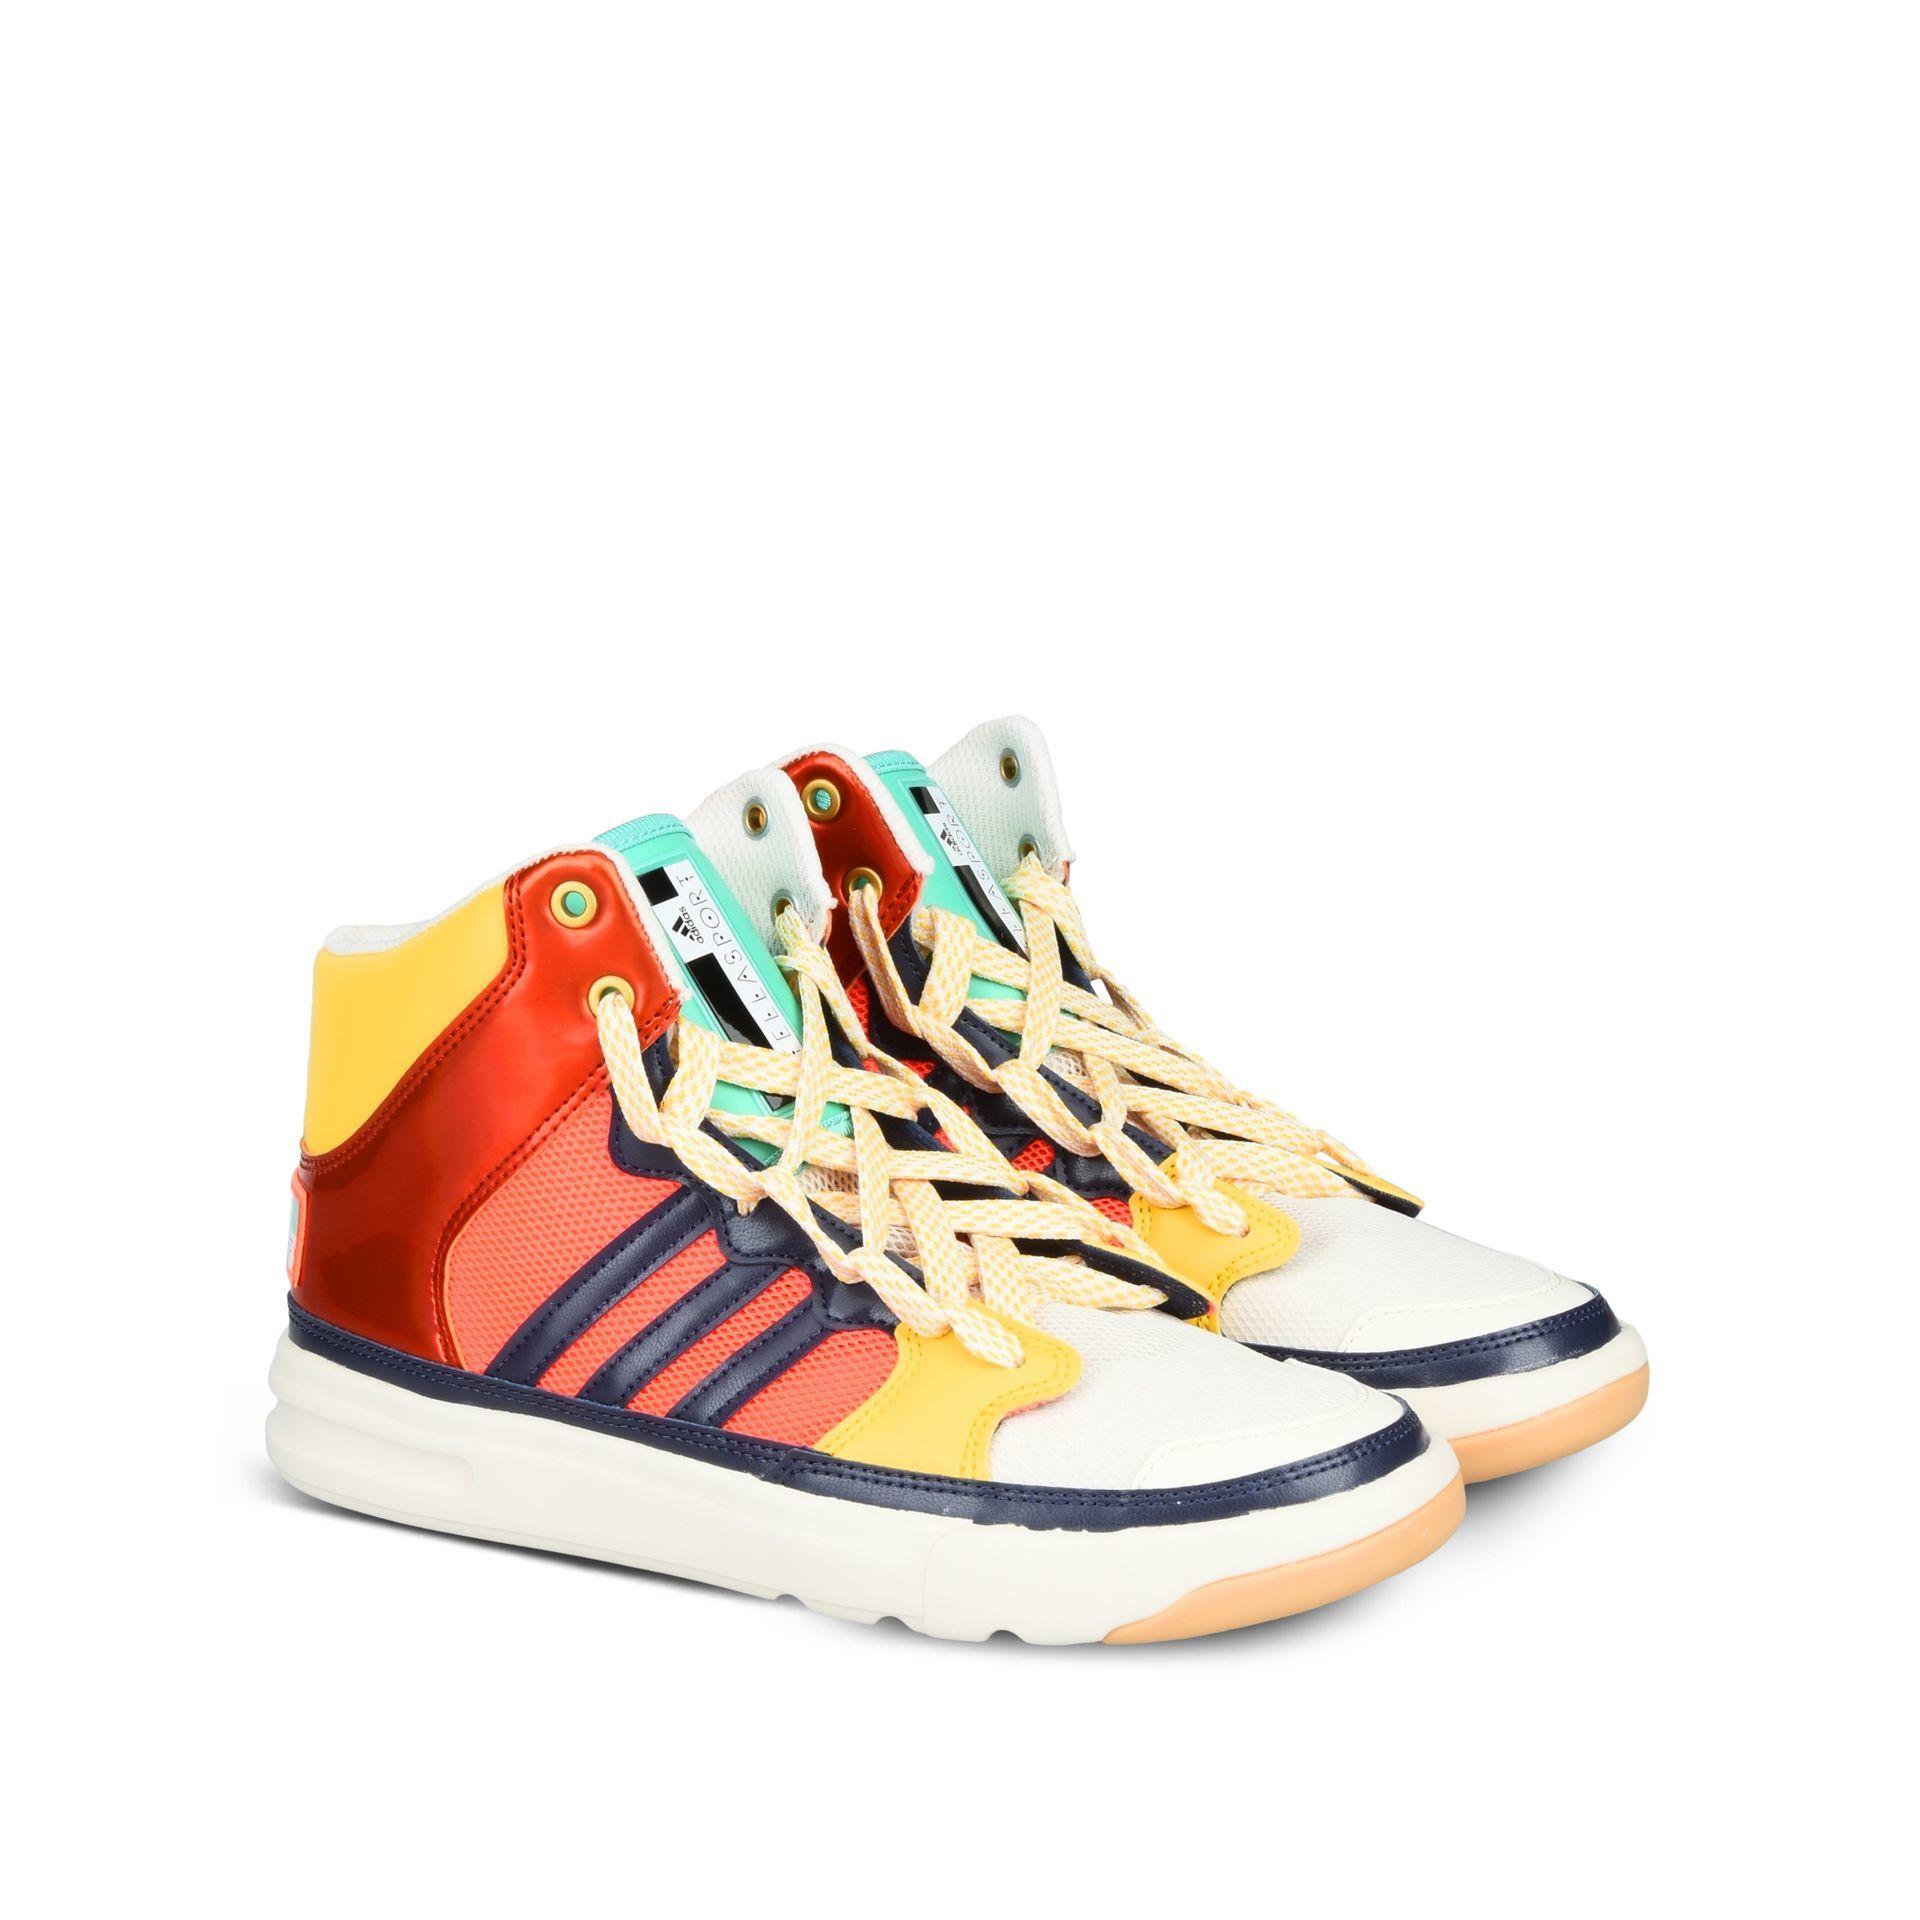 best loved 55db8 67ac3 stella mccartney striped adidas shoes - Google Search